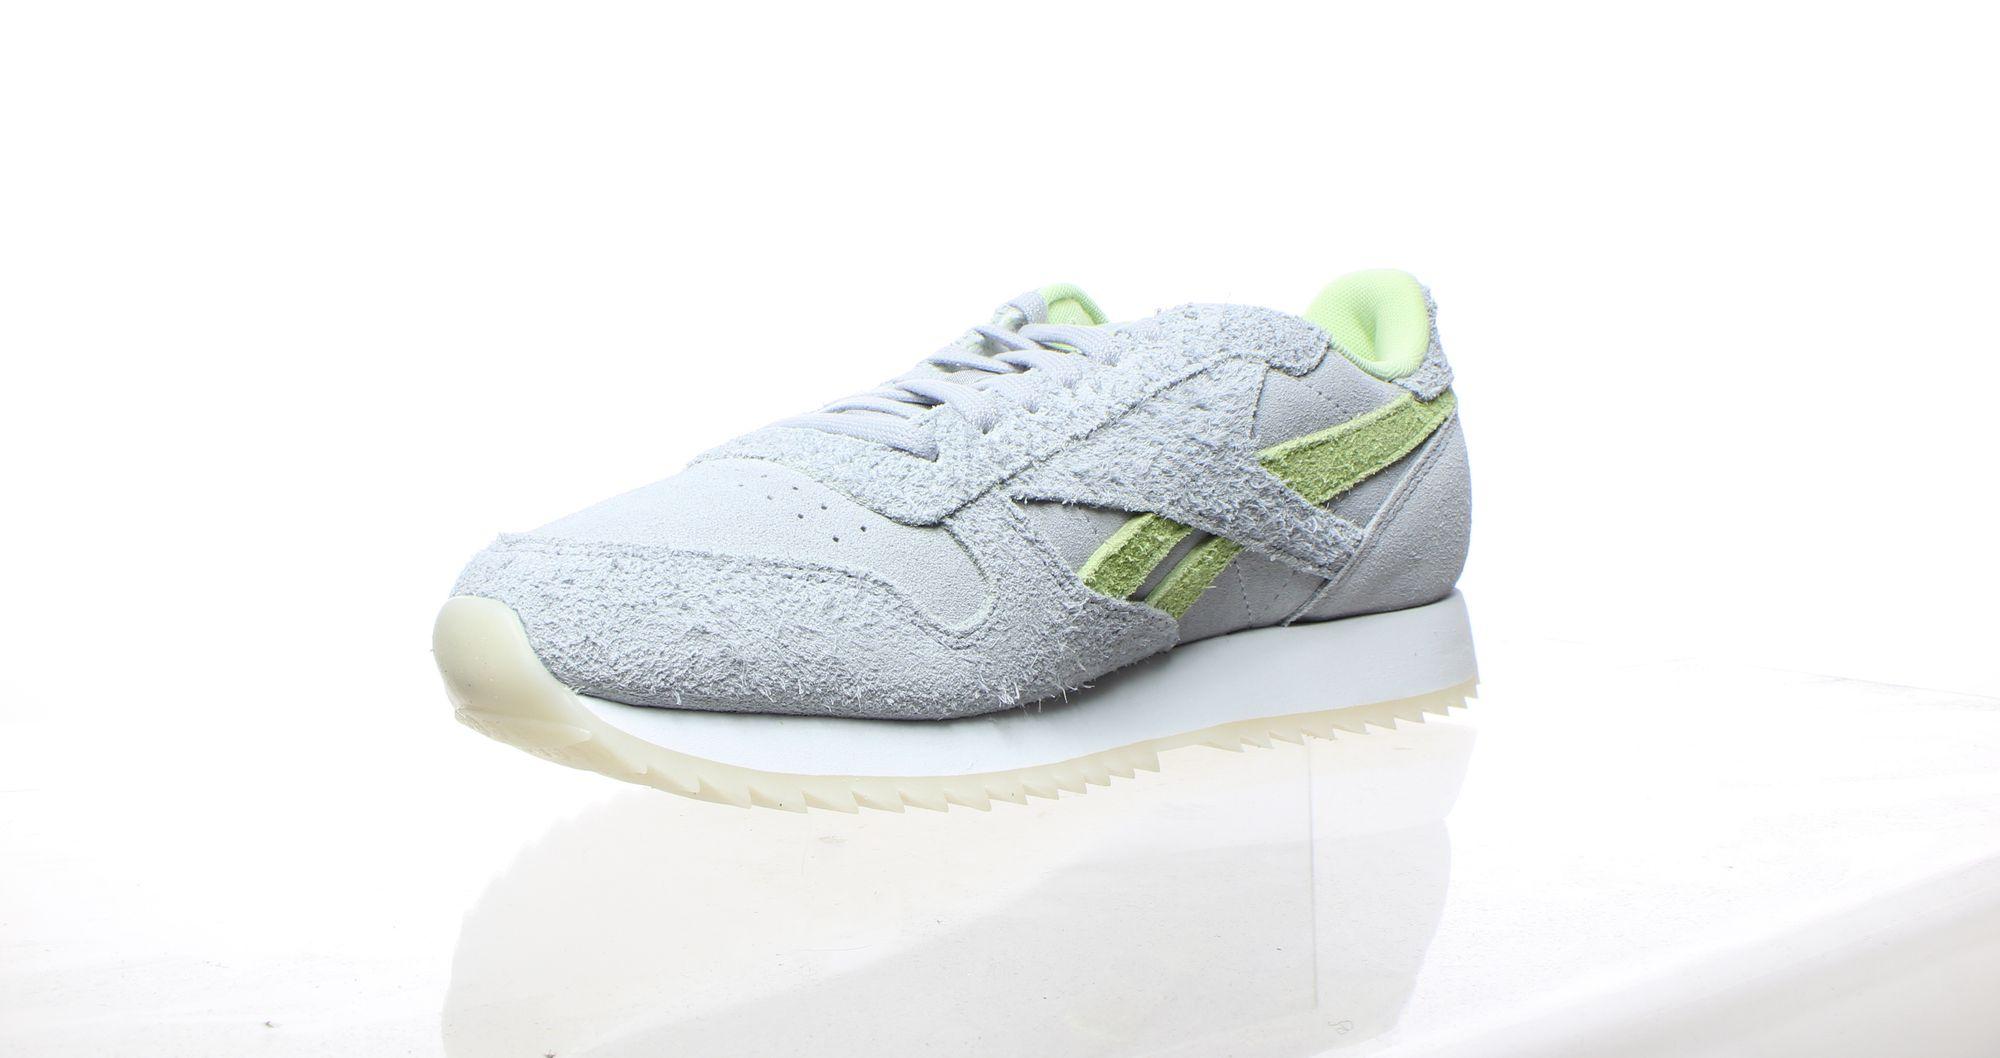 Reebok-Mens-Classic-Leather-Ripple-Fashion-Sneakers thumbnail 11